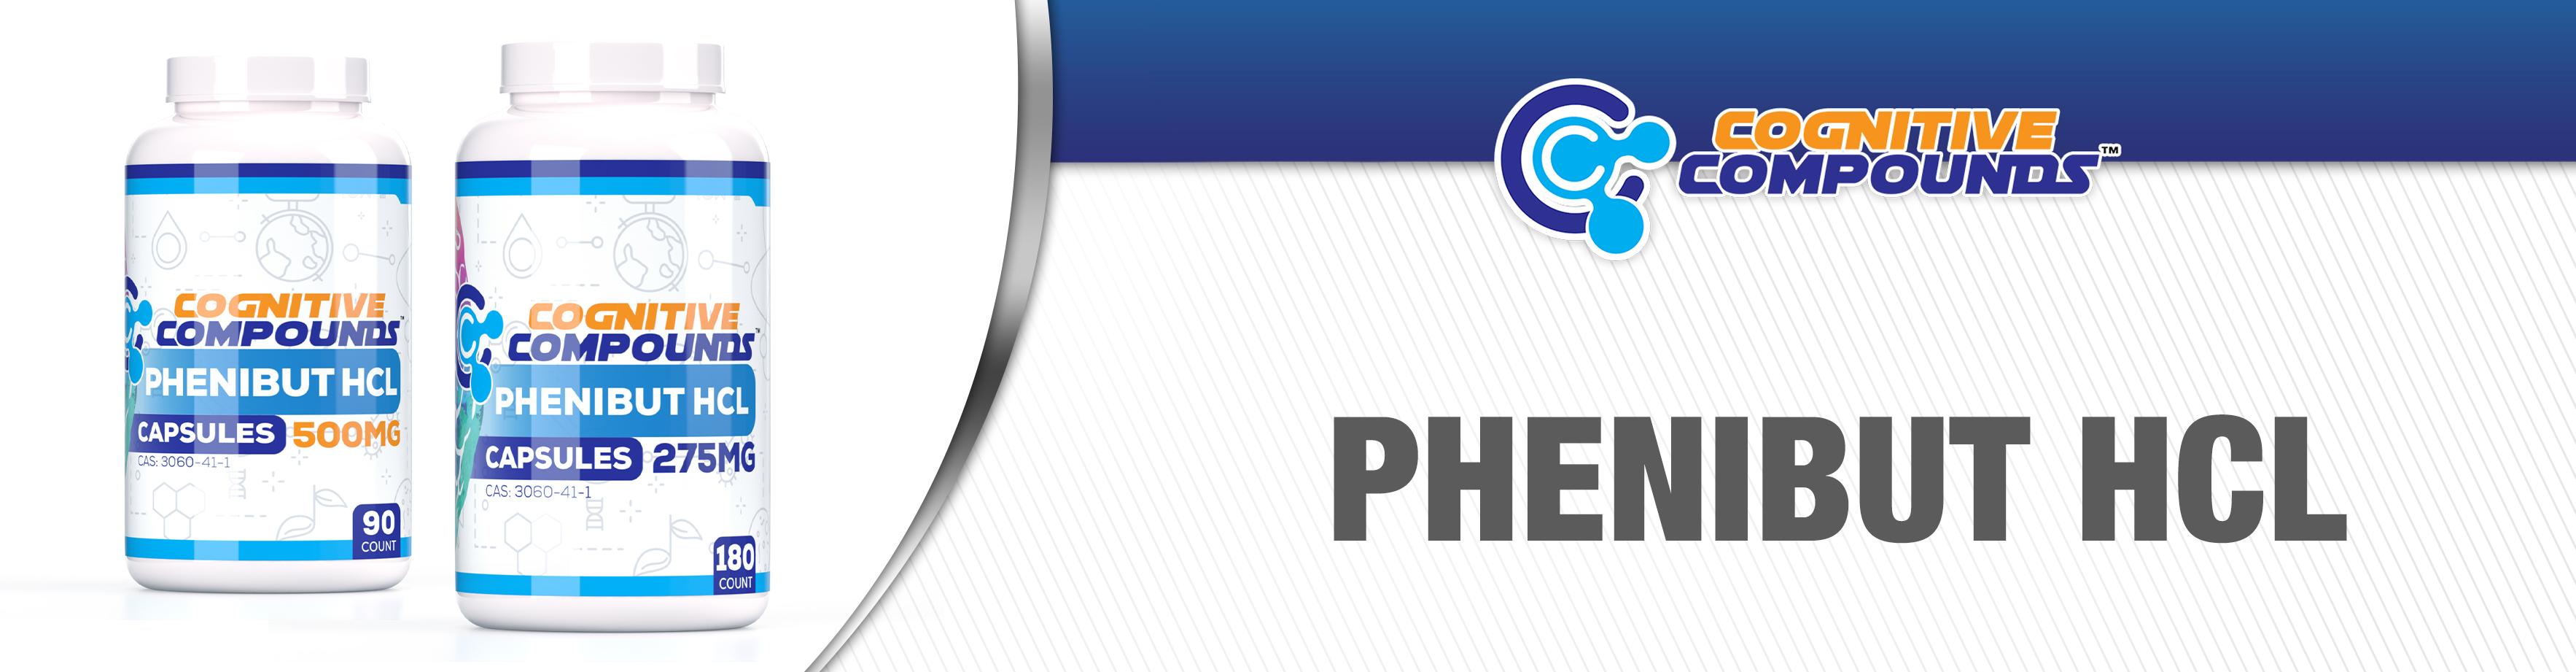 phenibut-hcl-capsules-10-21.jpg